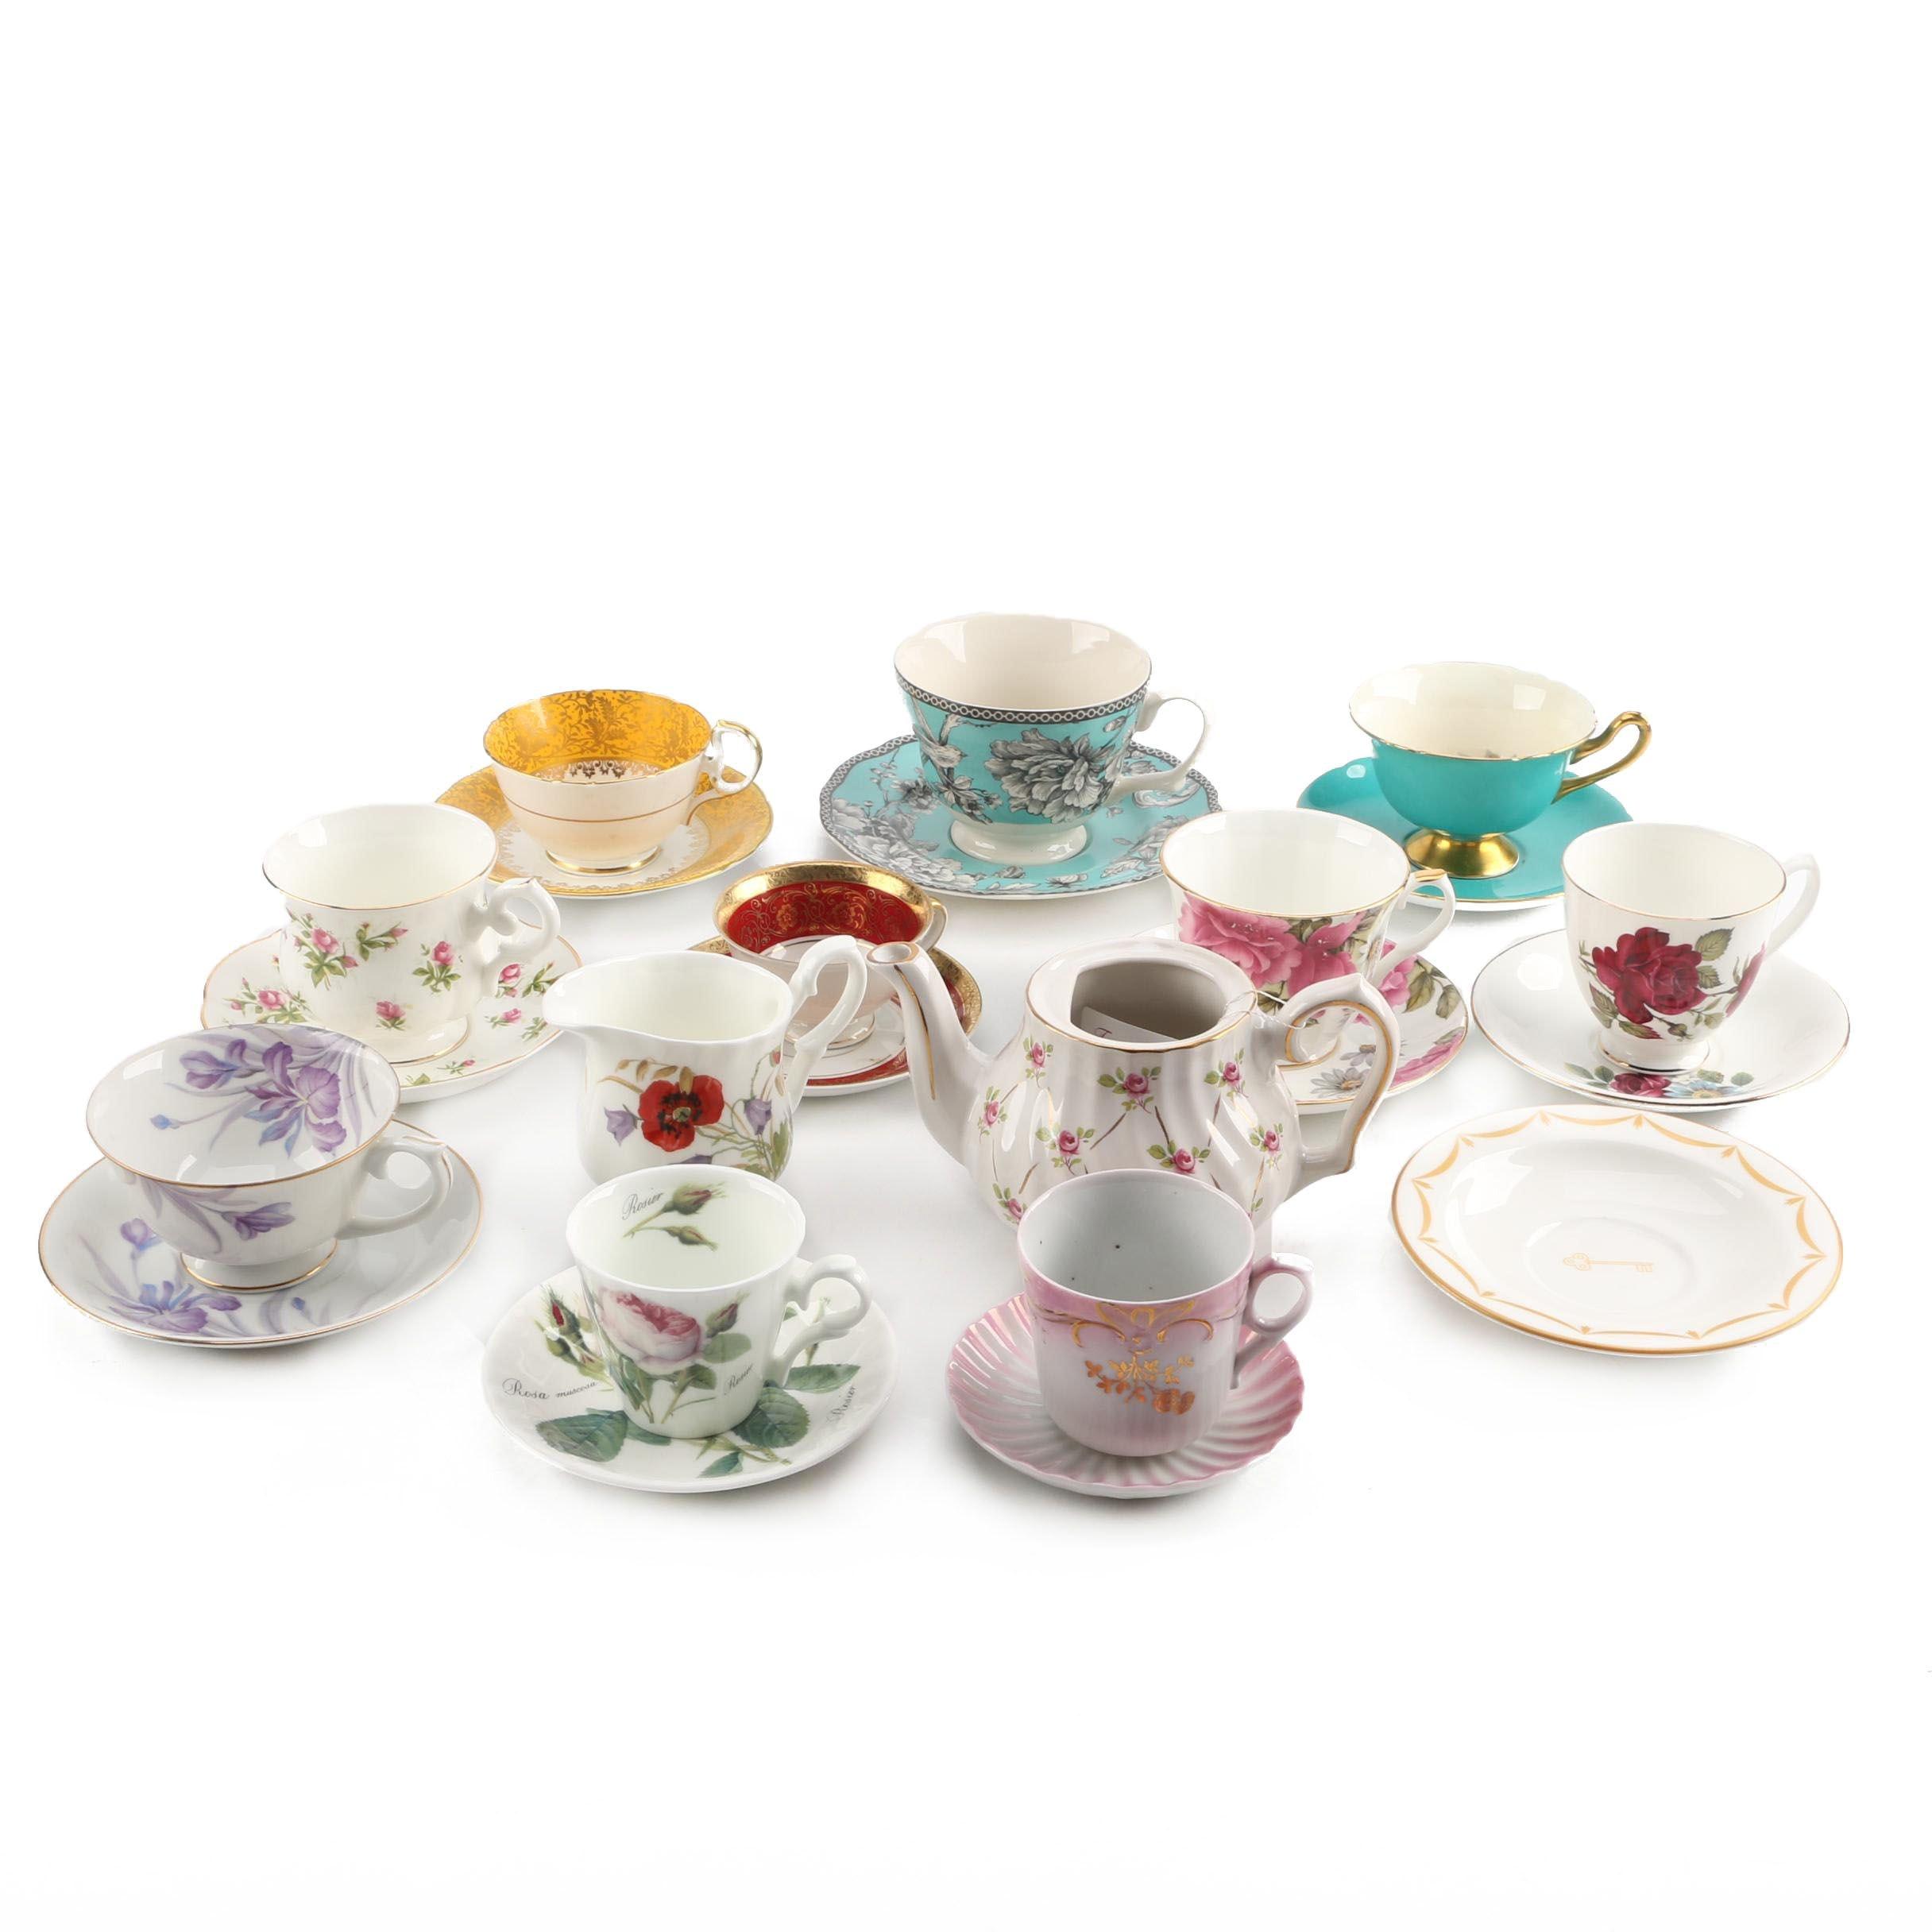 Porcelain Teacups and Saucers